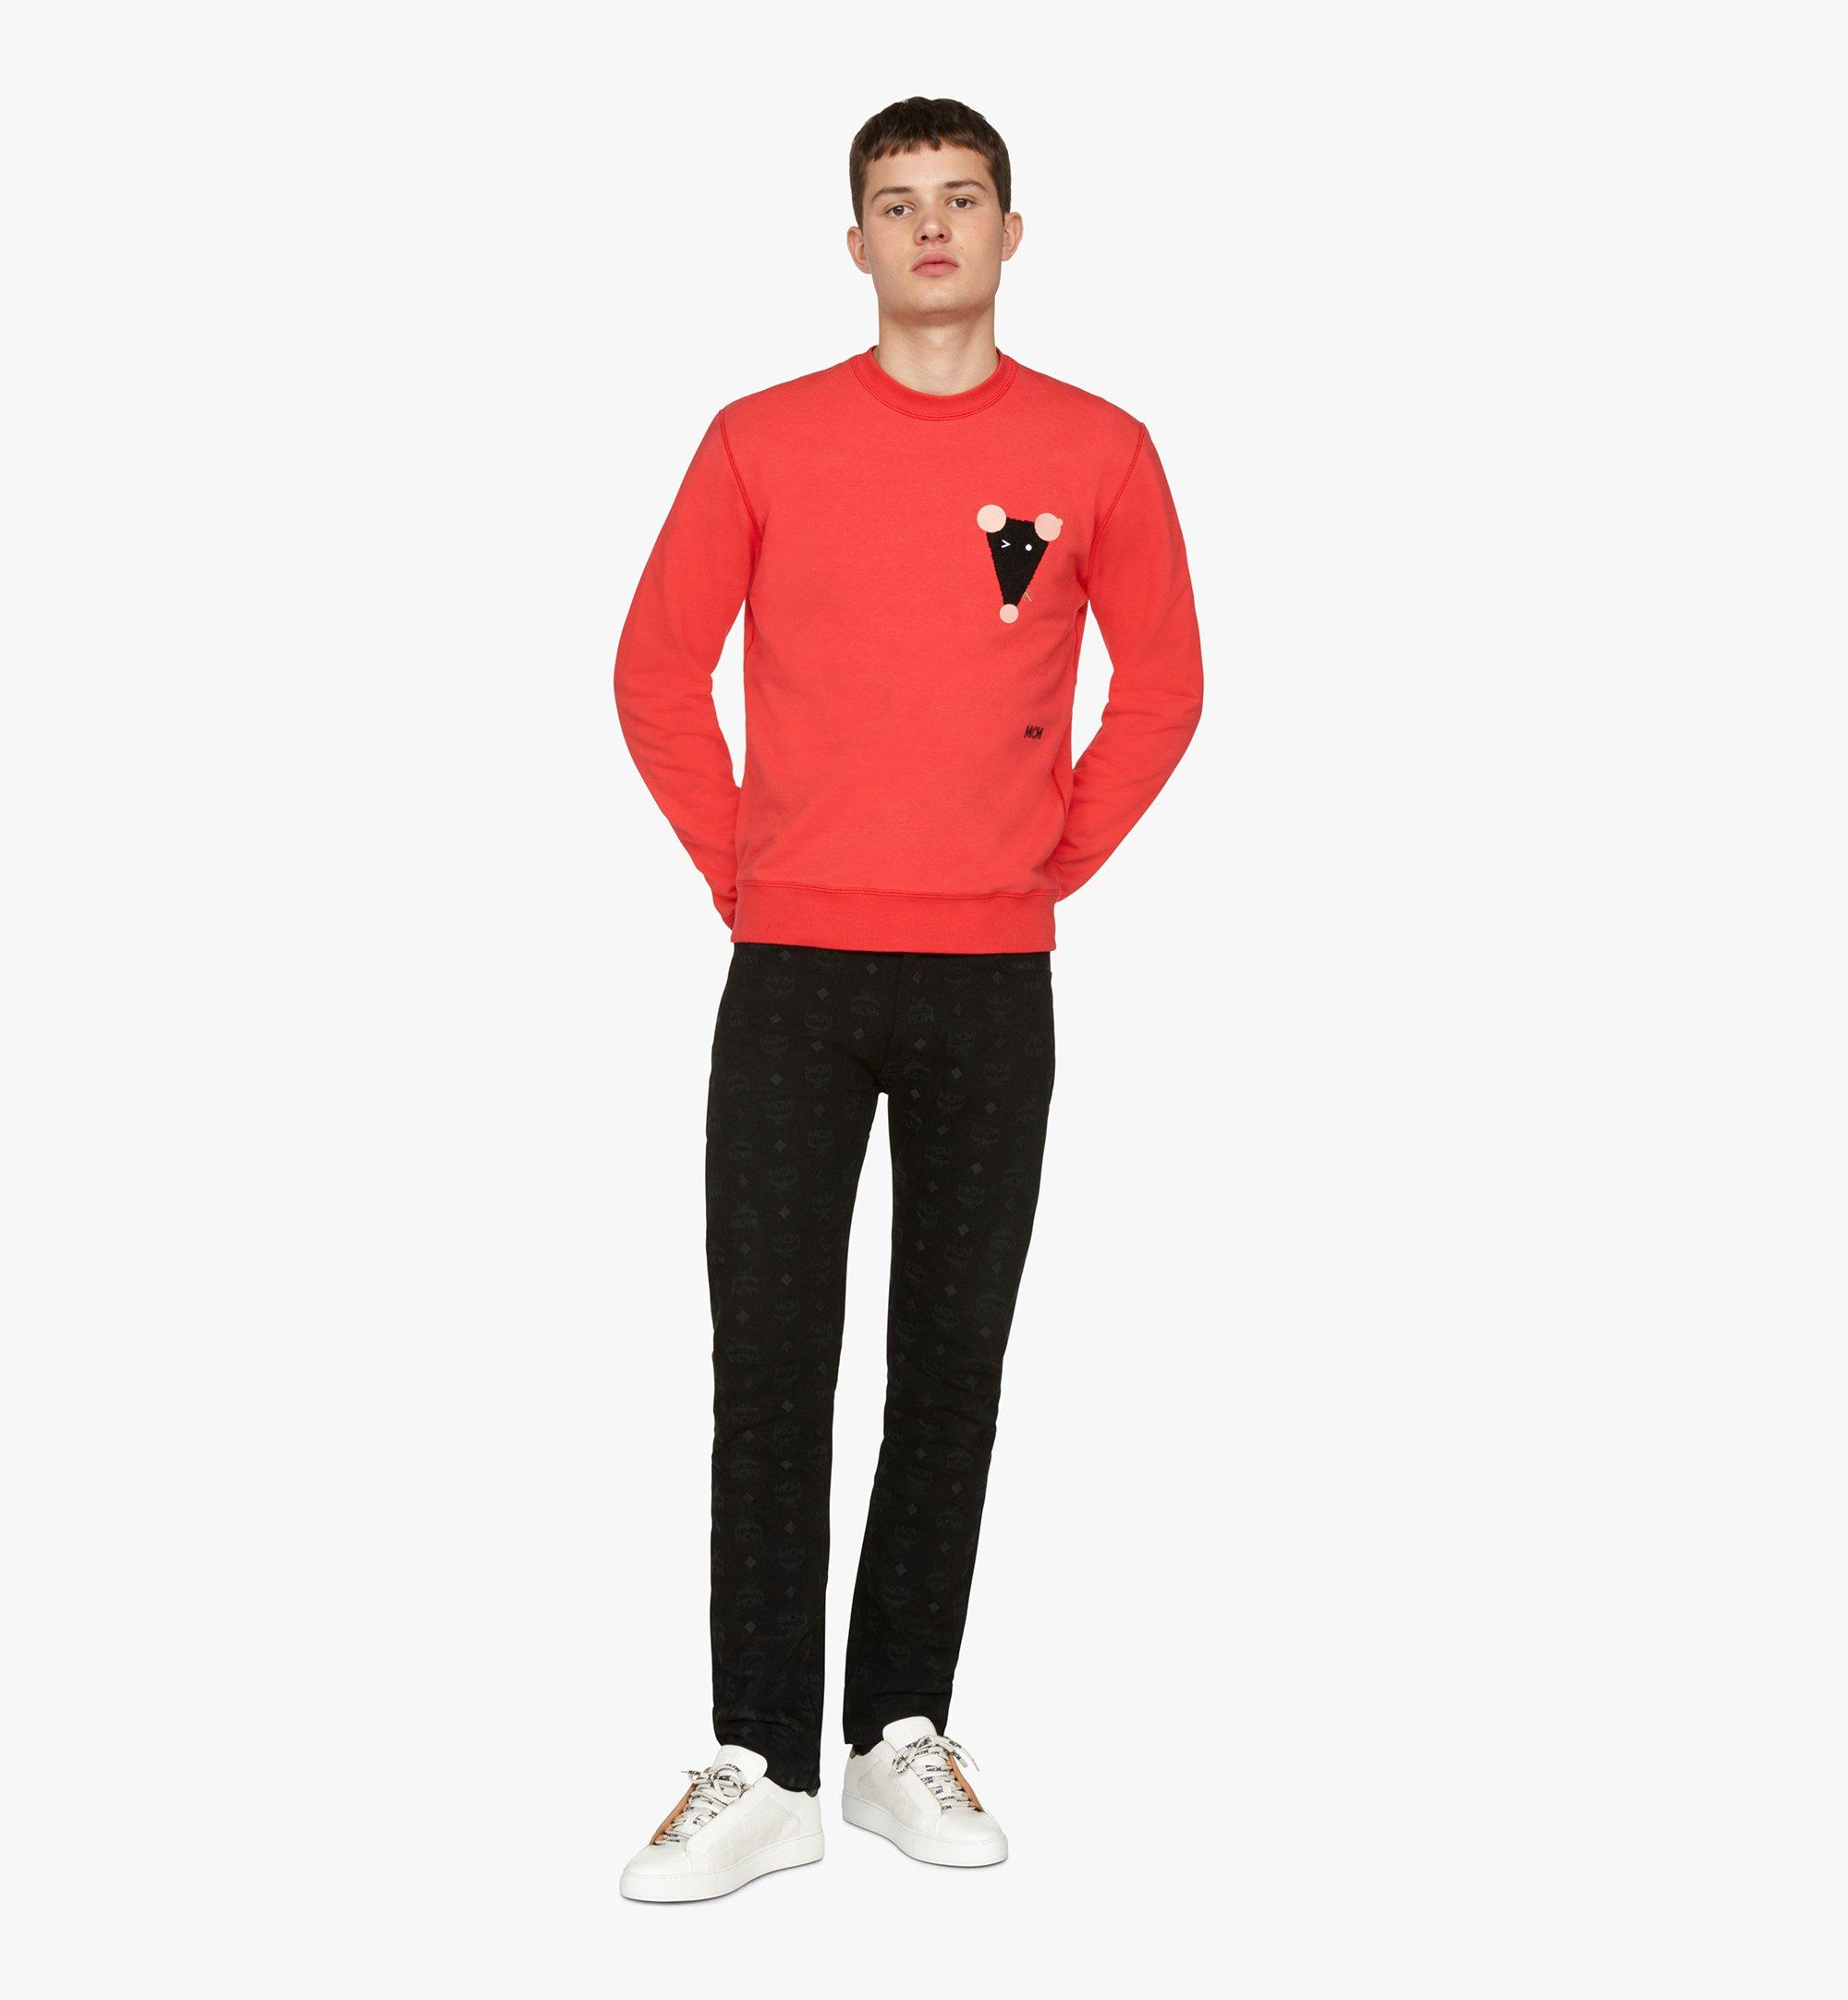 MCM Men's Year Of The Mouse Mockneck Sweatshirt Red MHAASSE02R400M Alternate View 2